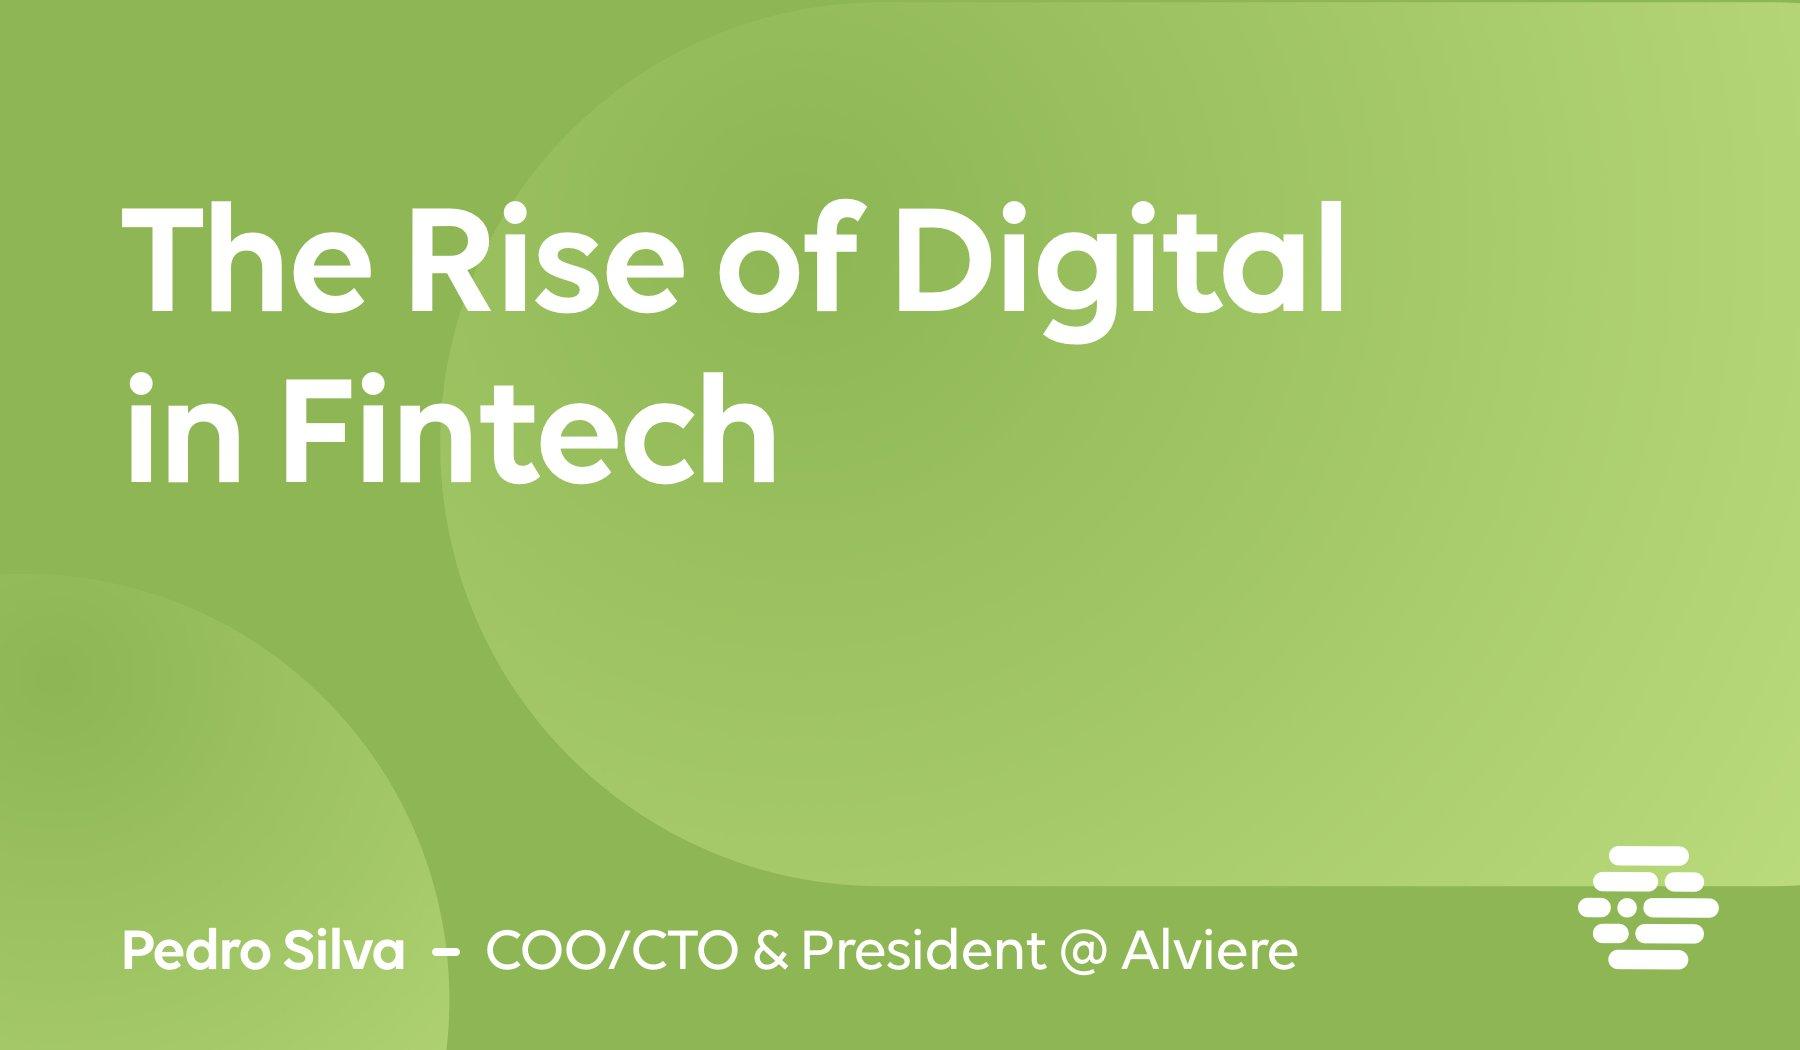 The Rise of Digital Fintech